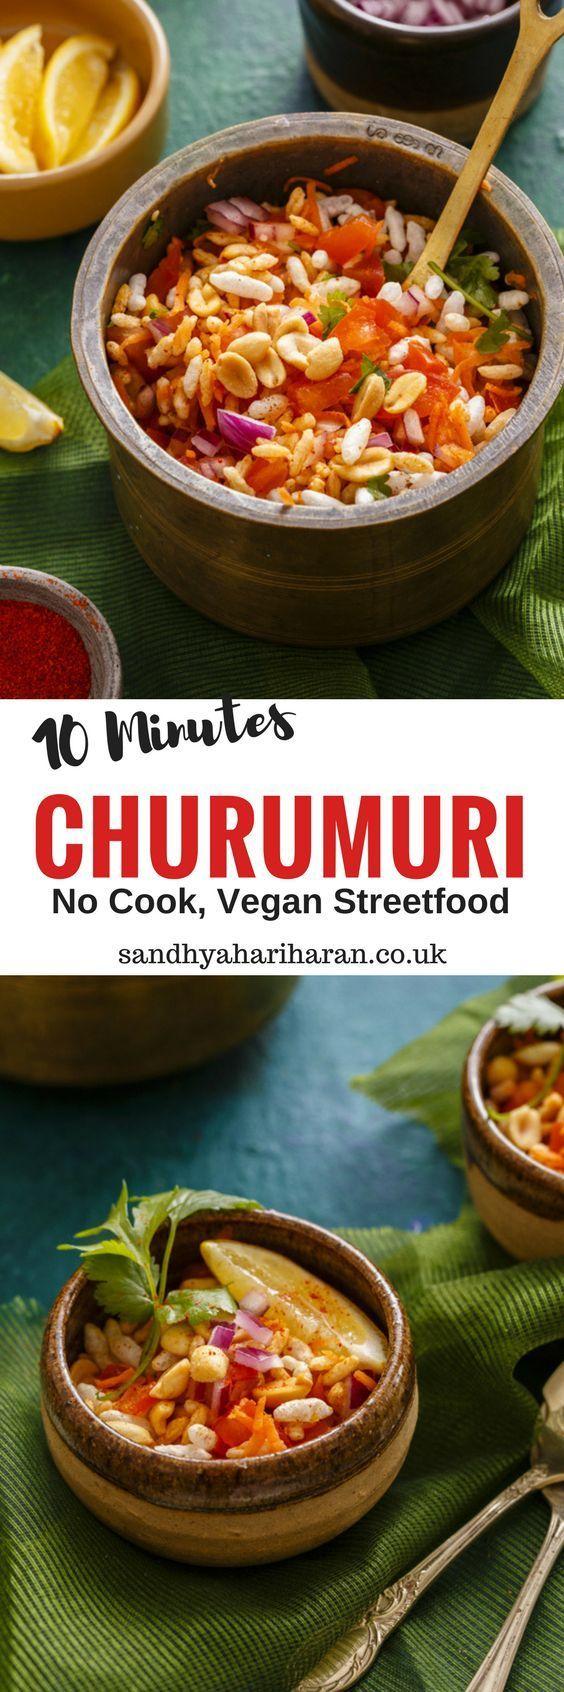 Churumuri Recipe Easy Dinner Recipes Pinterest Food Recipes